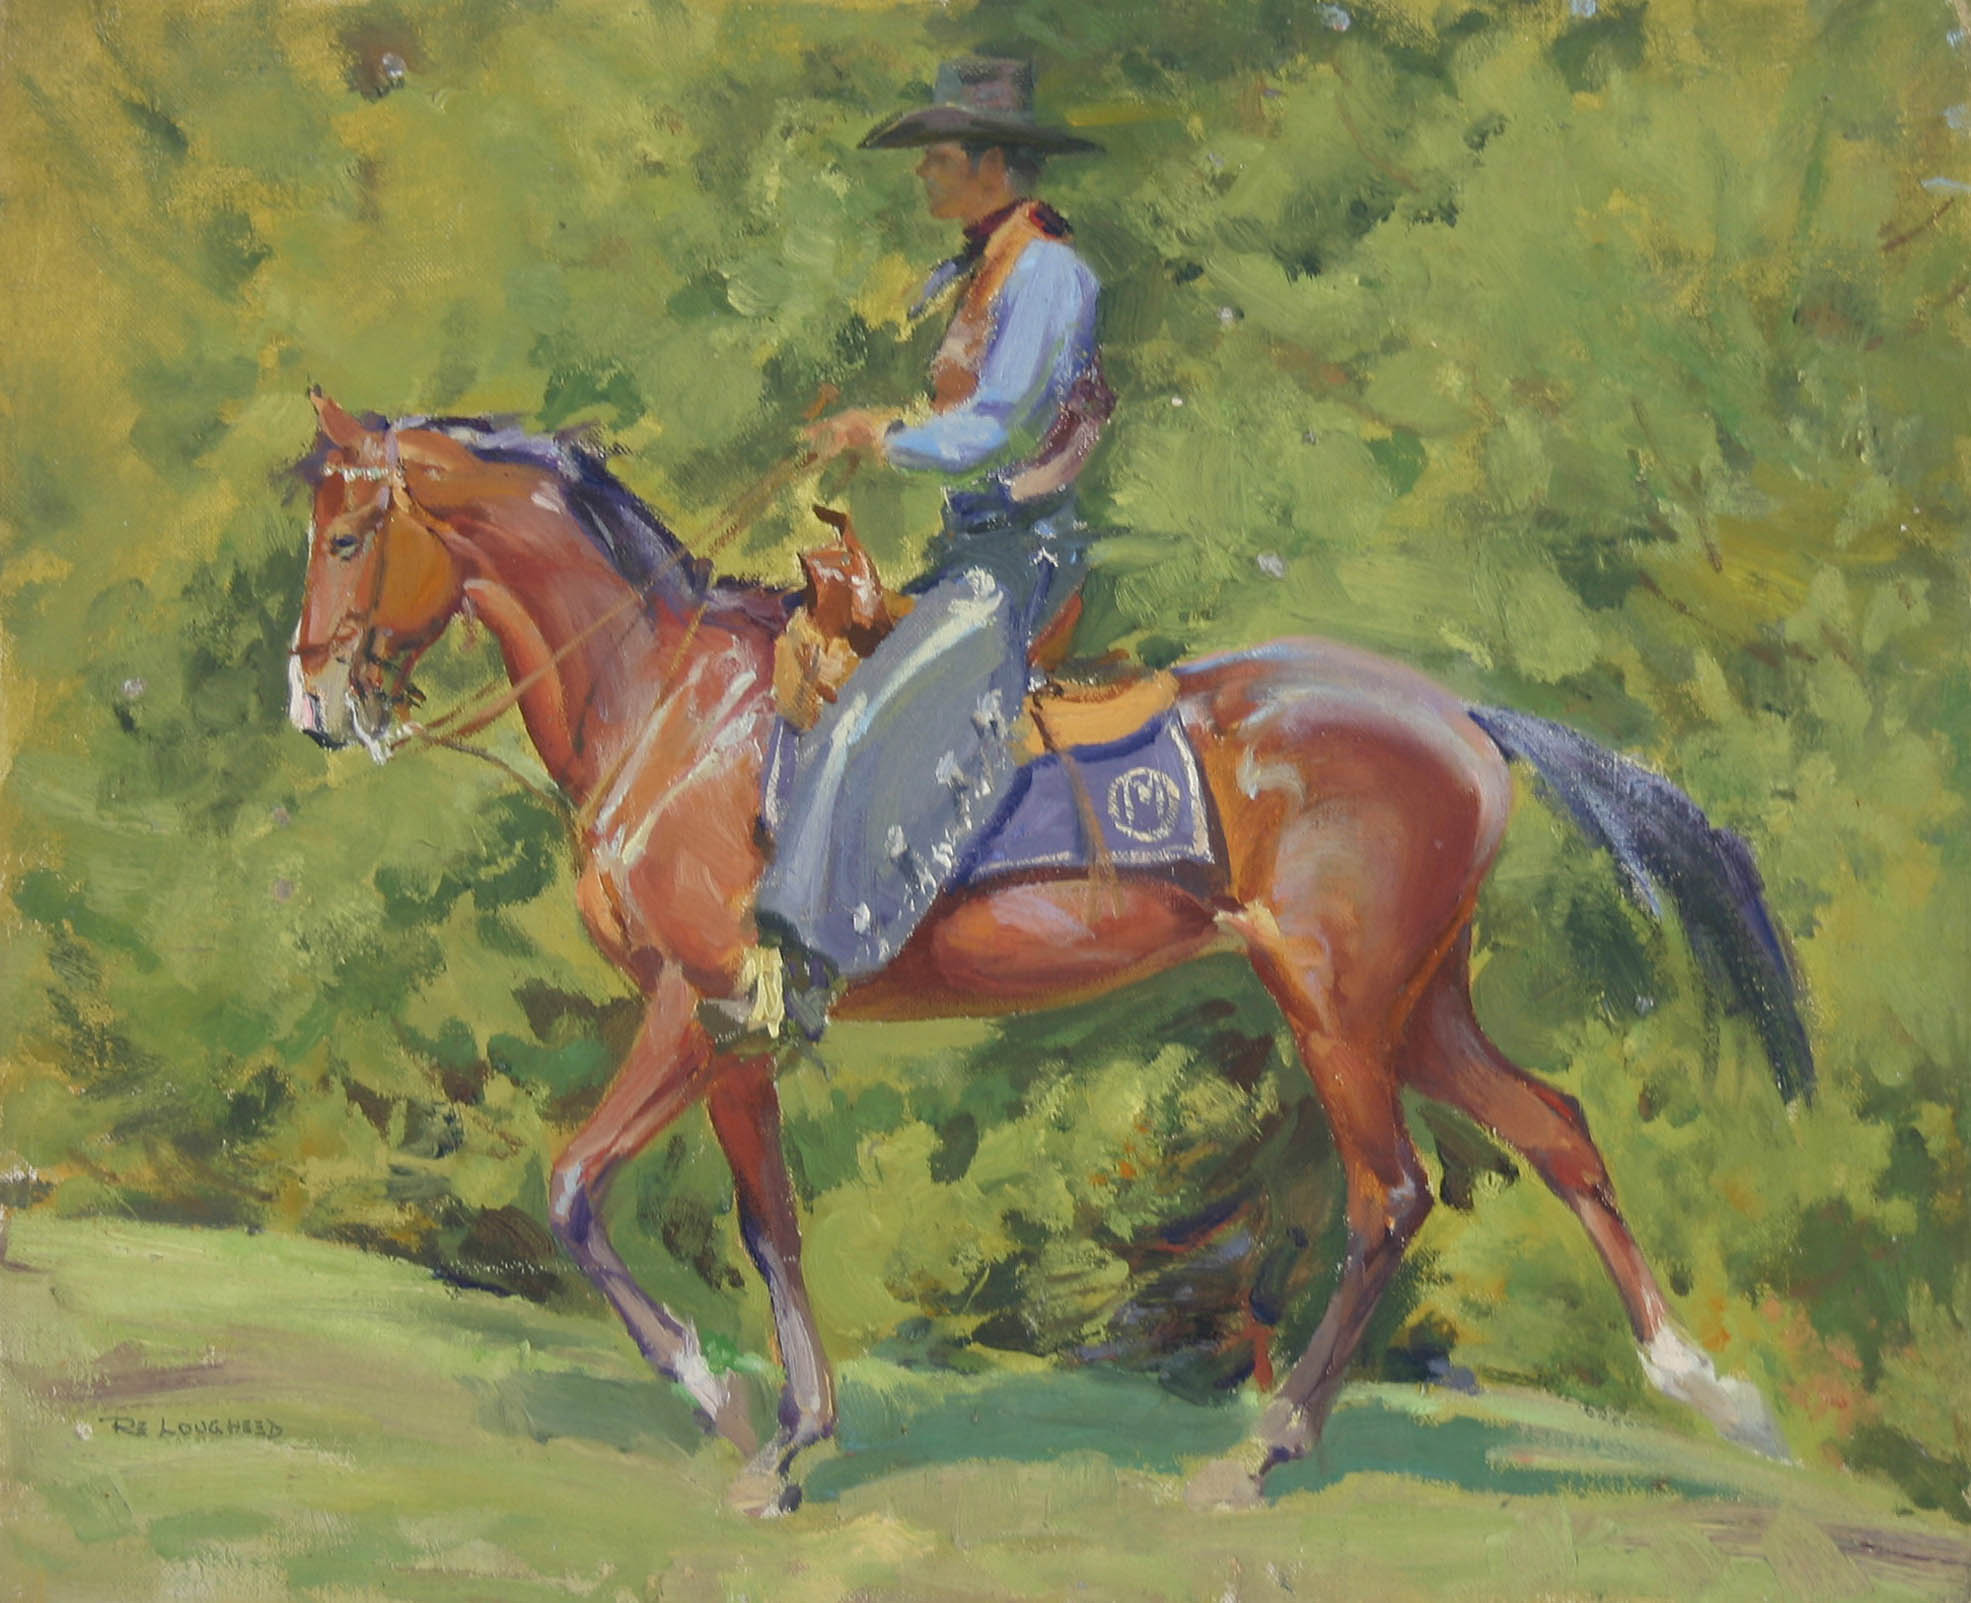 Cowboy on Horse by  Robert Lougheed - Masterpiece Online